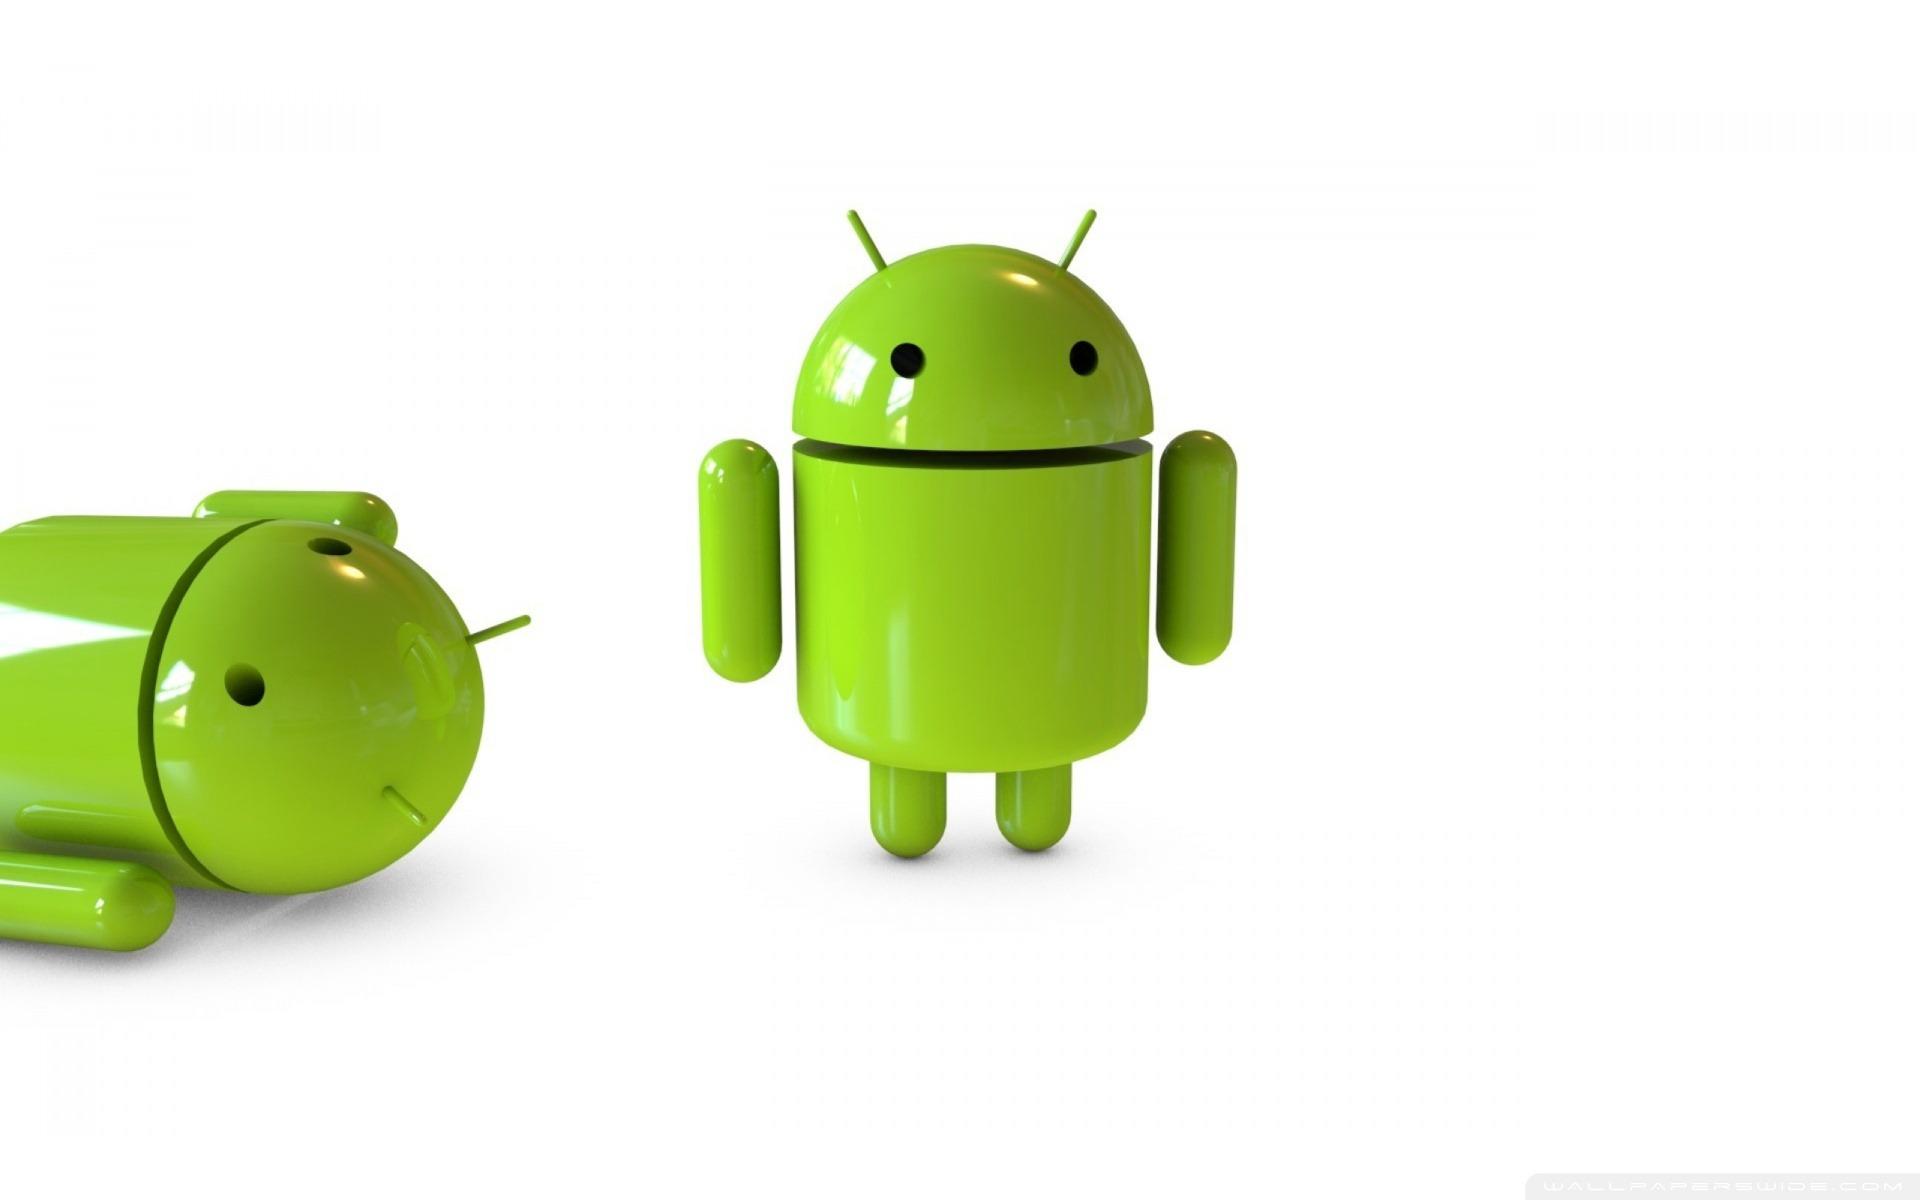 Android বেব্যহারকারী ভাইদের জন্য আসাধারণ 2টি Softwere… যা এতদিন হয়ত আপনারা এই App 2টি খুজতেছিলেন। Download করে নিন